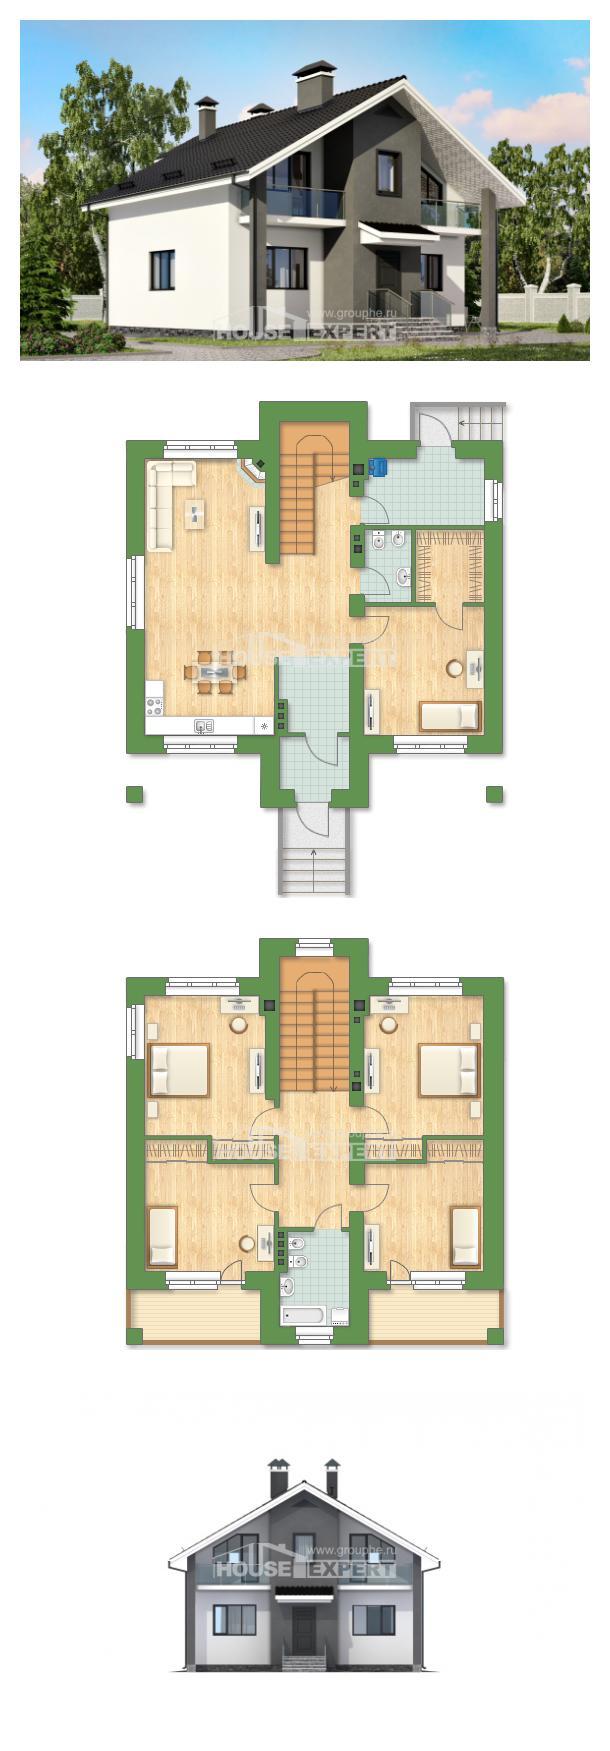 Проект дома 150-005-Л   House Expert